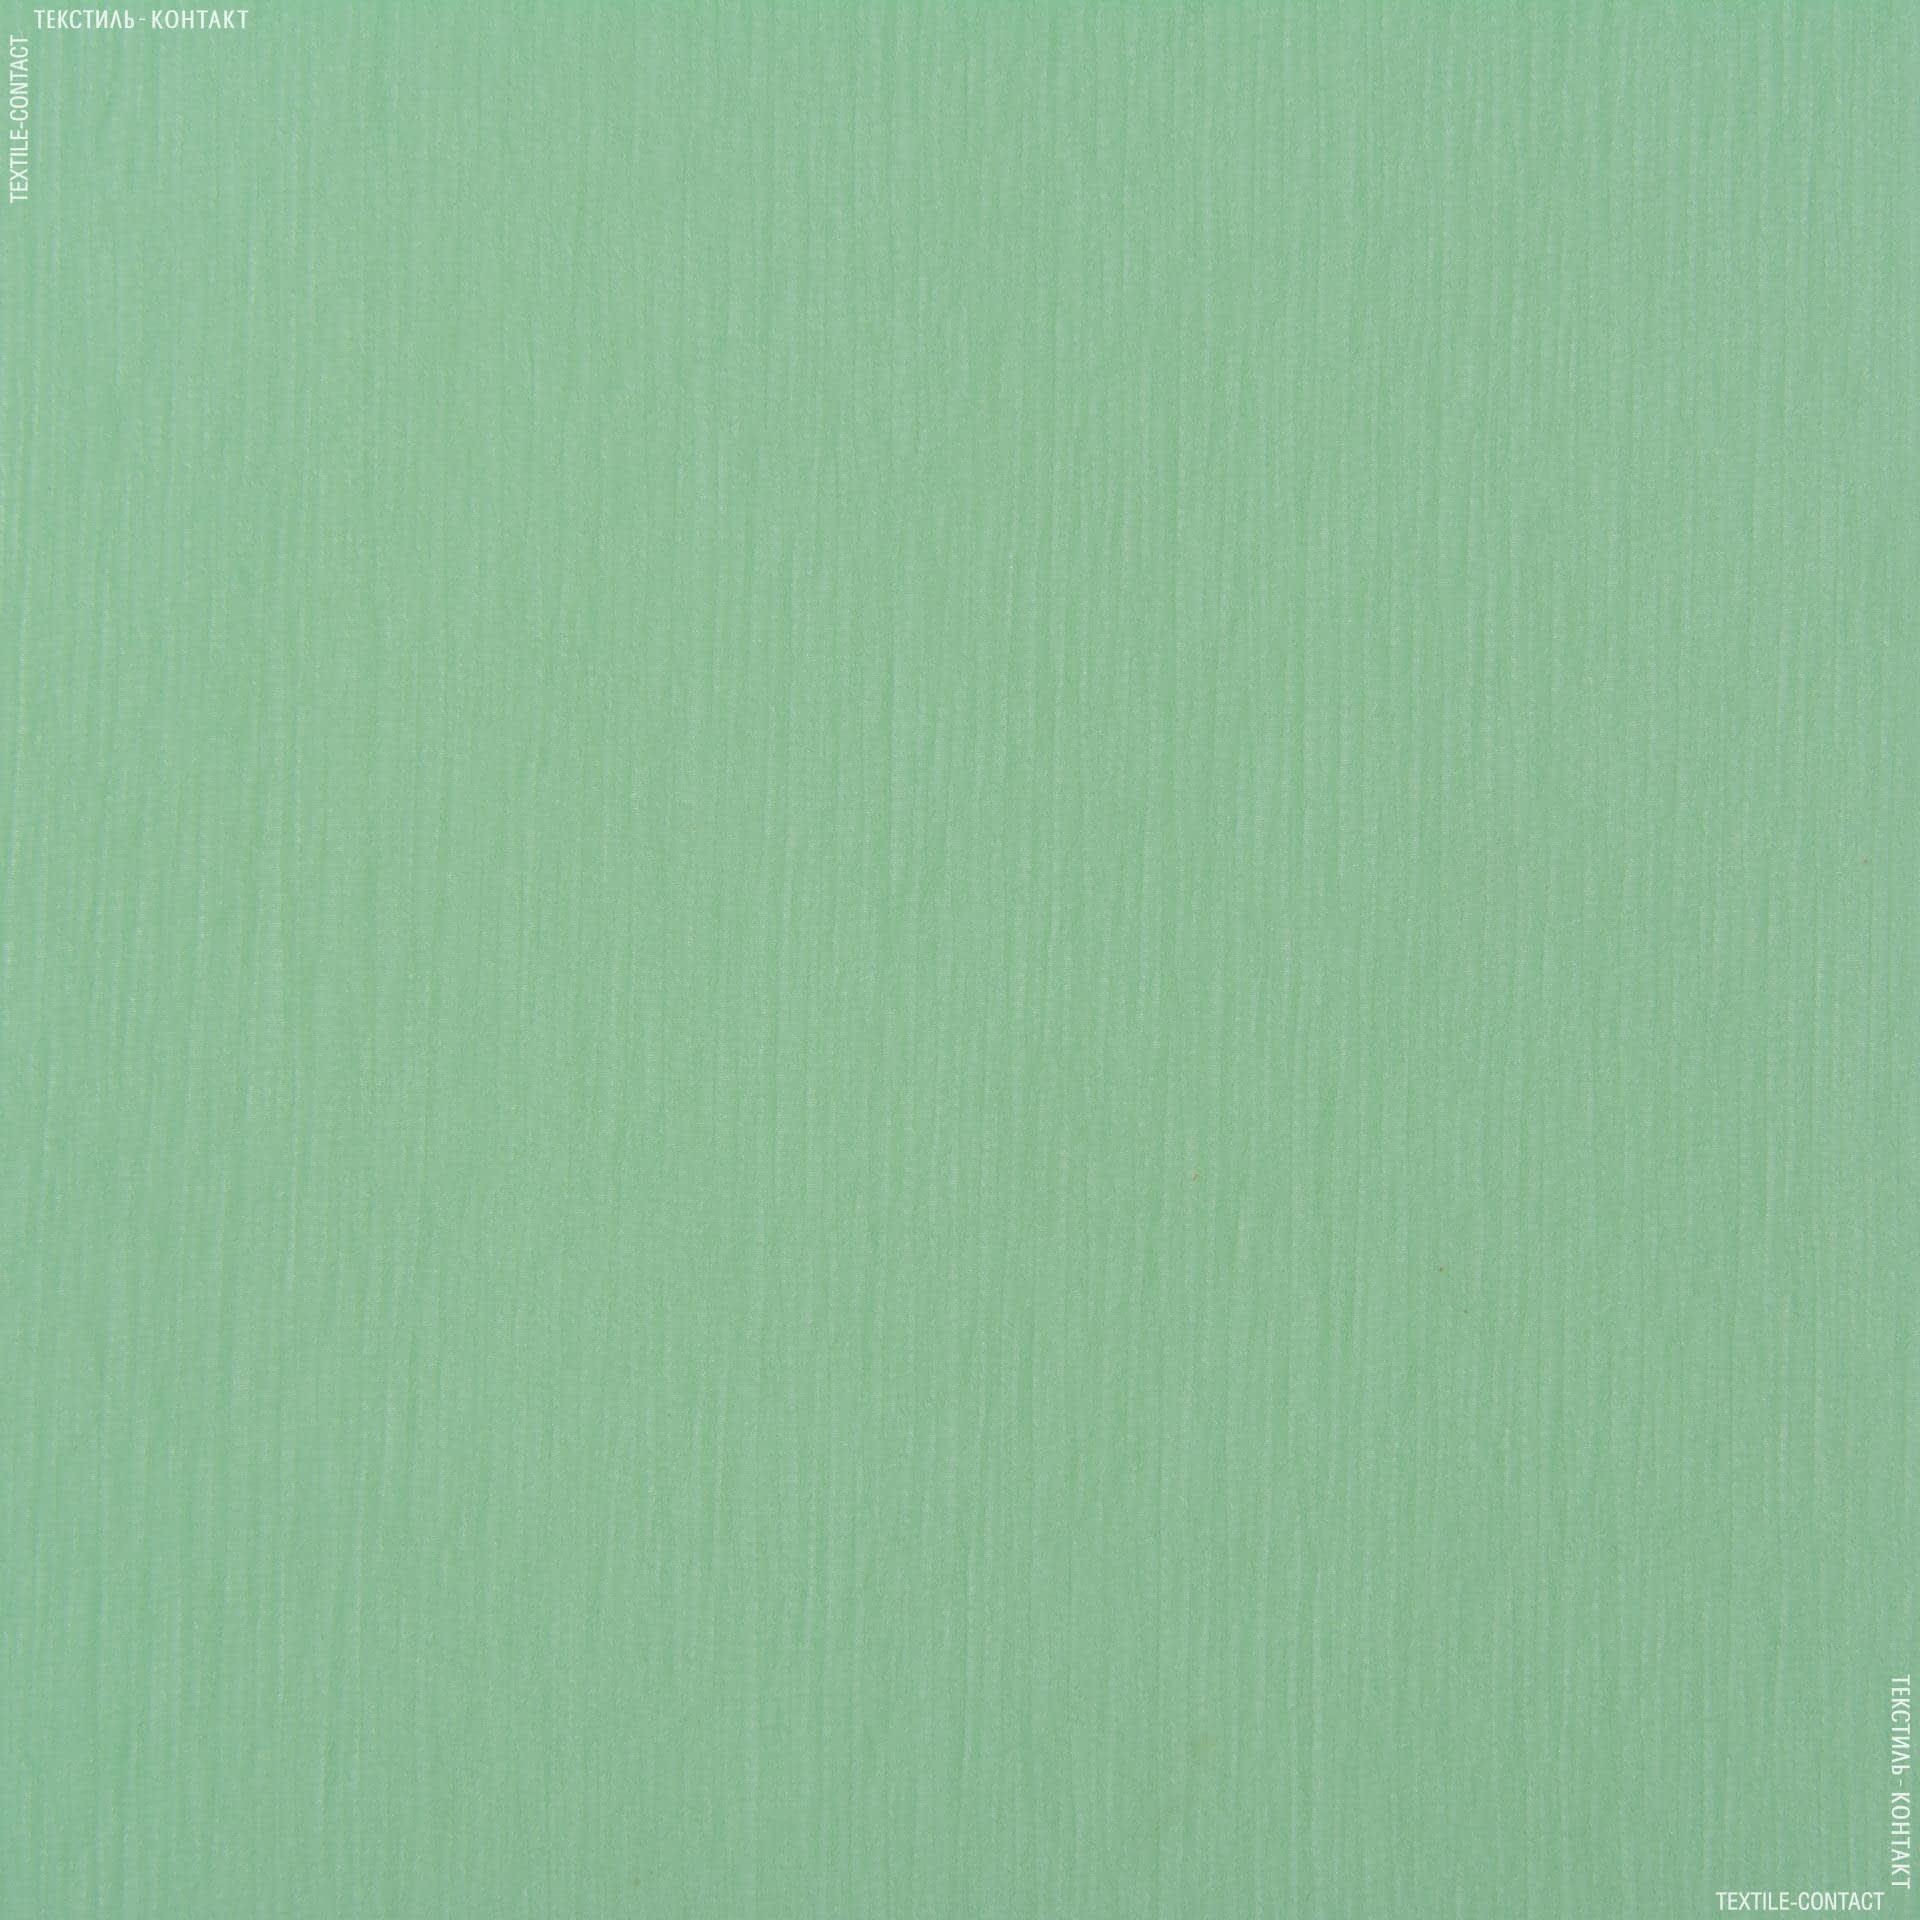 Тканини для хусток та бандан - Шифон євро м'ятний